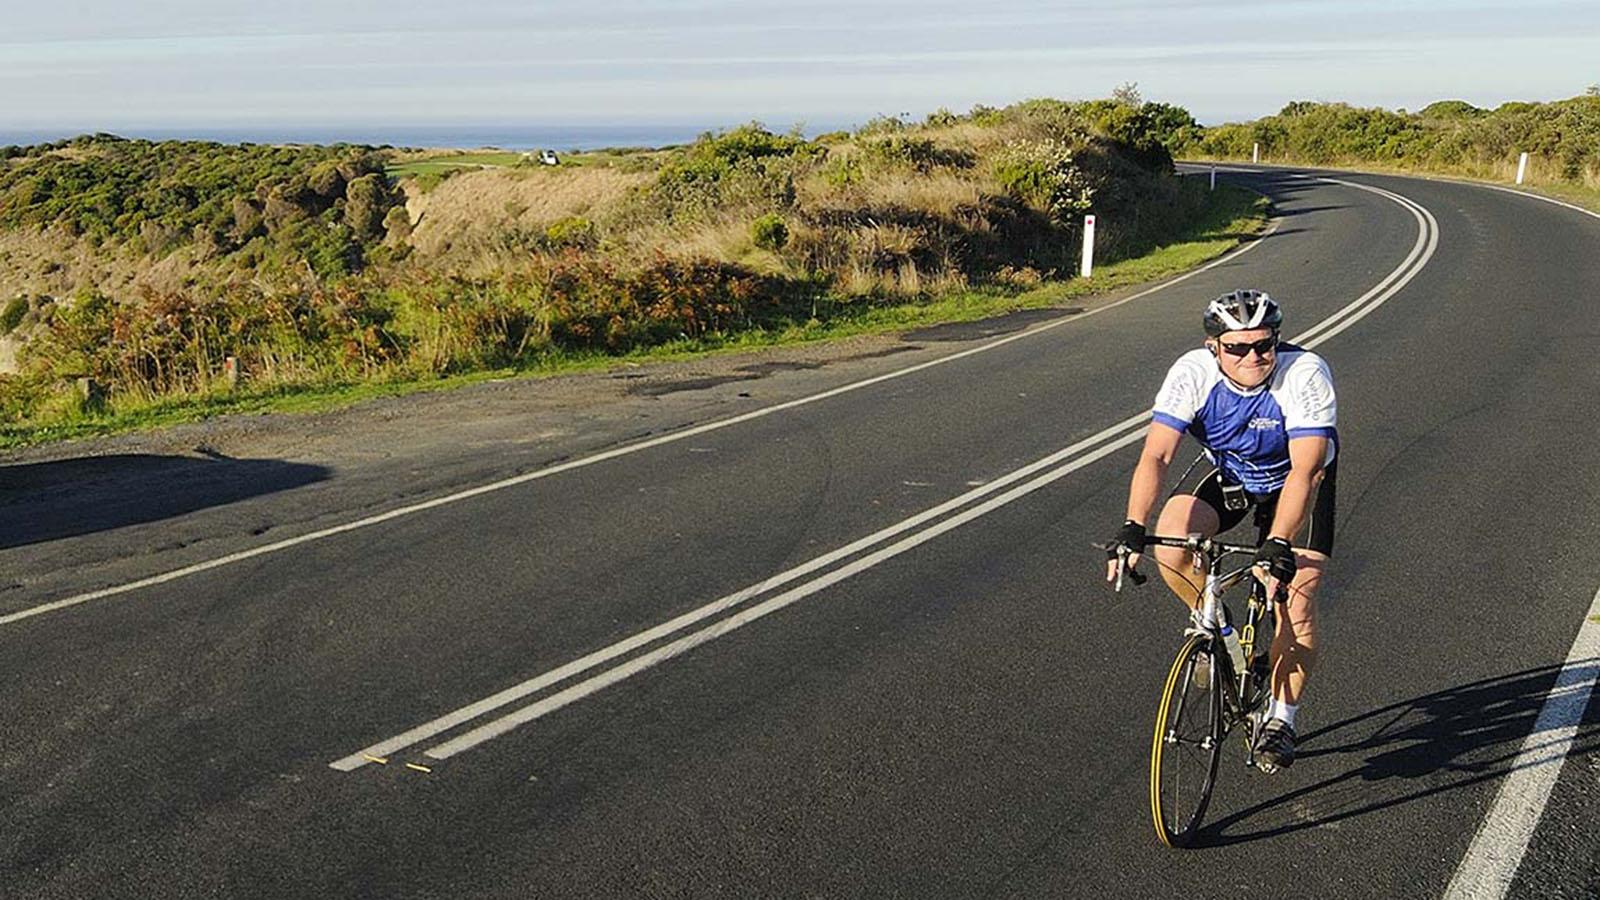 Road cycling near Inverloch, Gippsland, Victoria, Australia